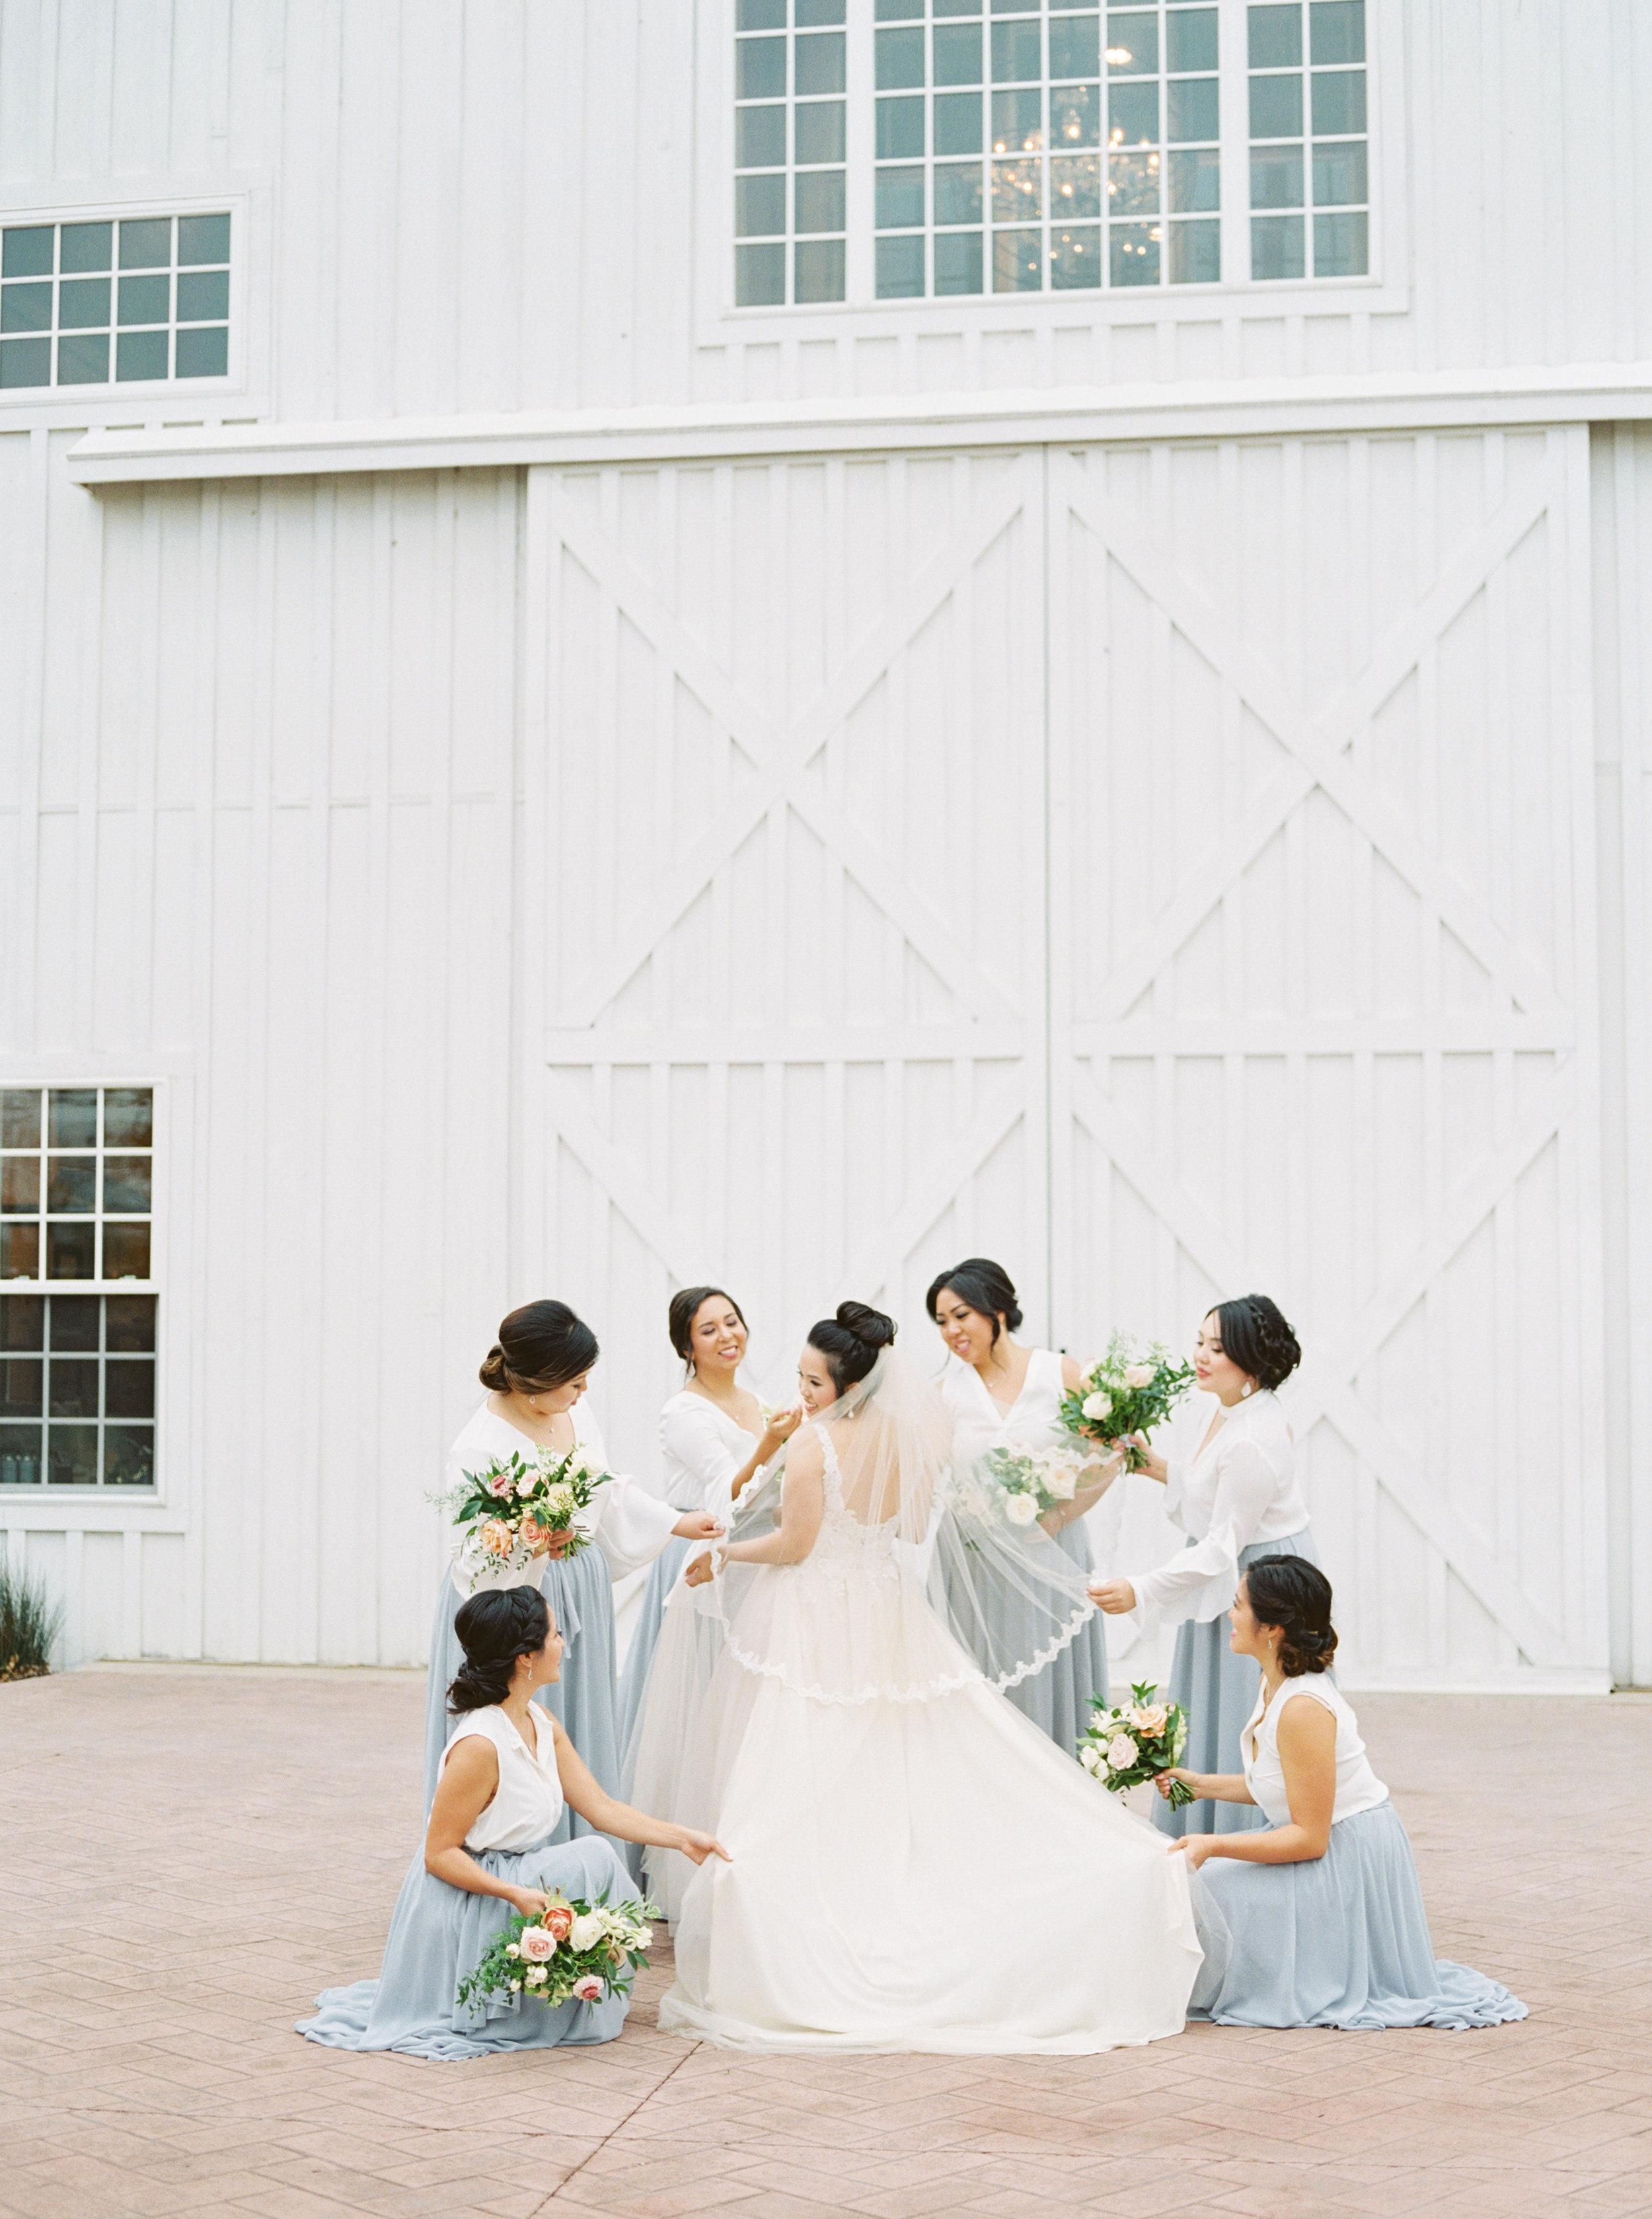 Lucy+JB Wedding_427 copy.JPG